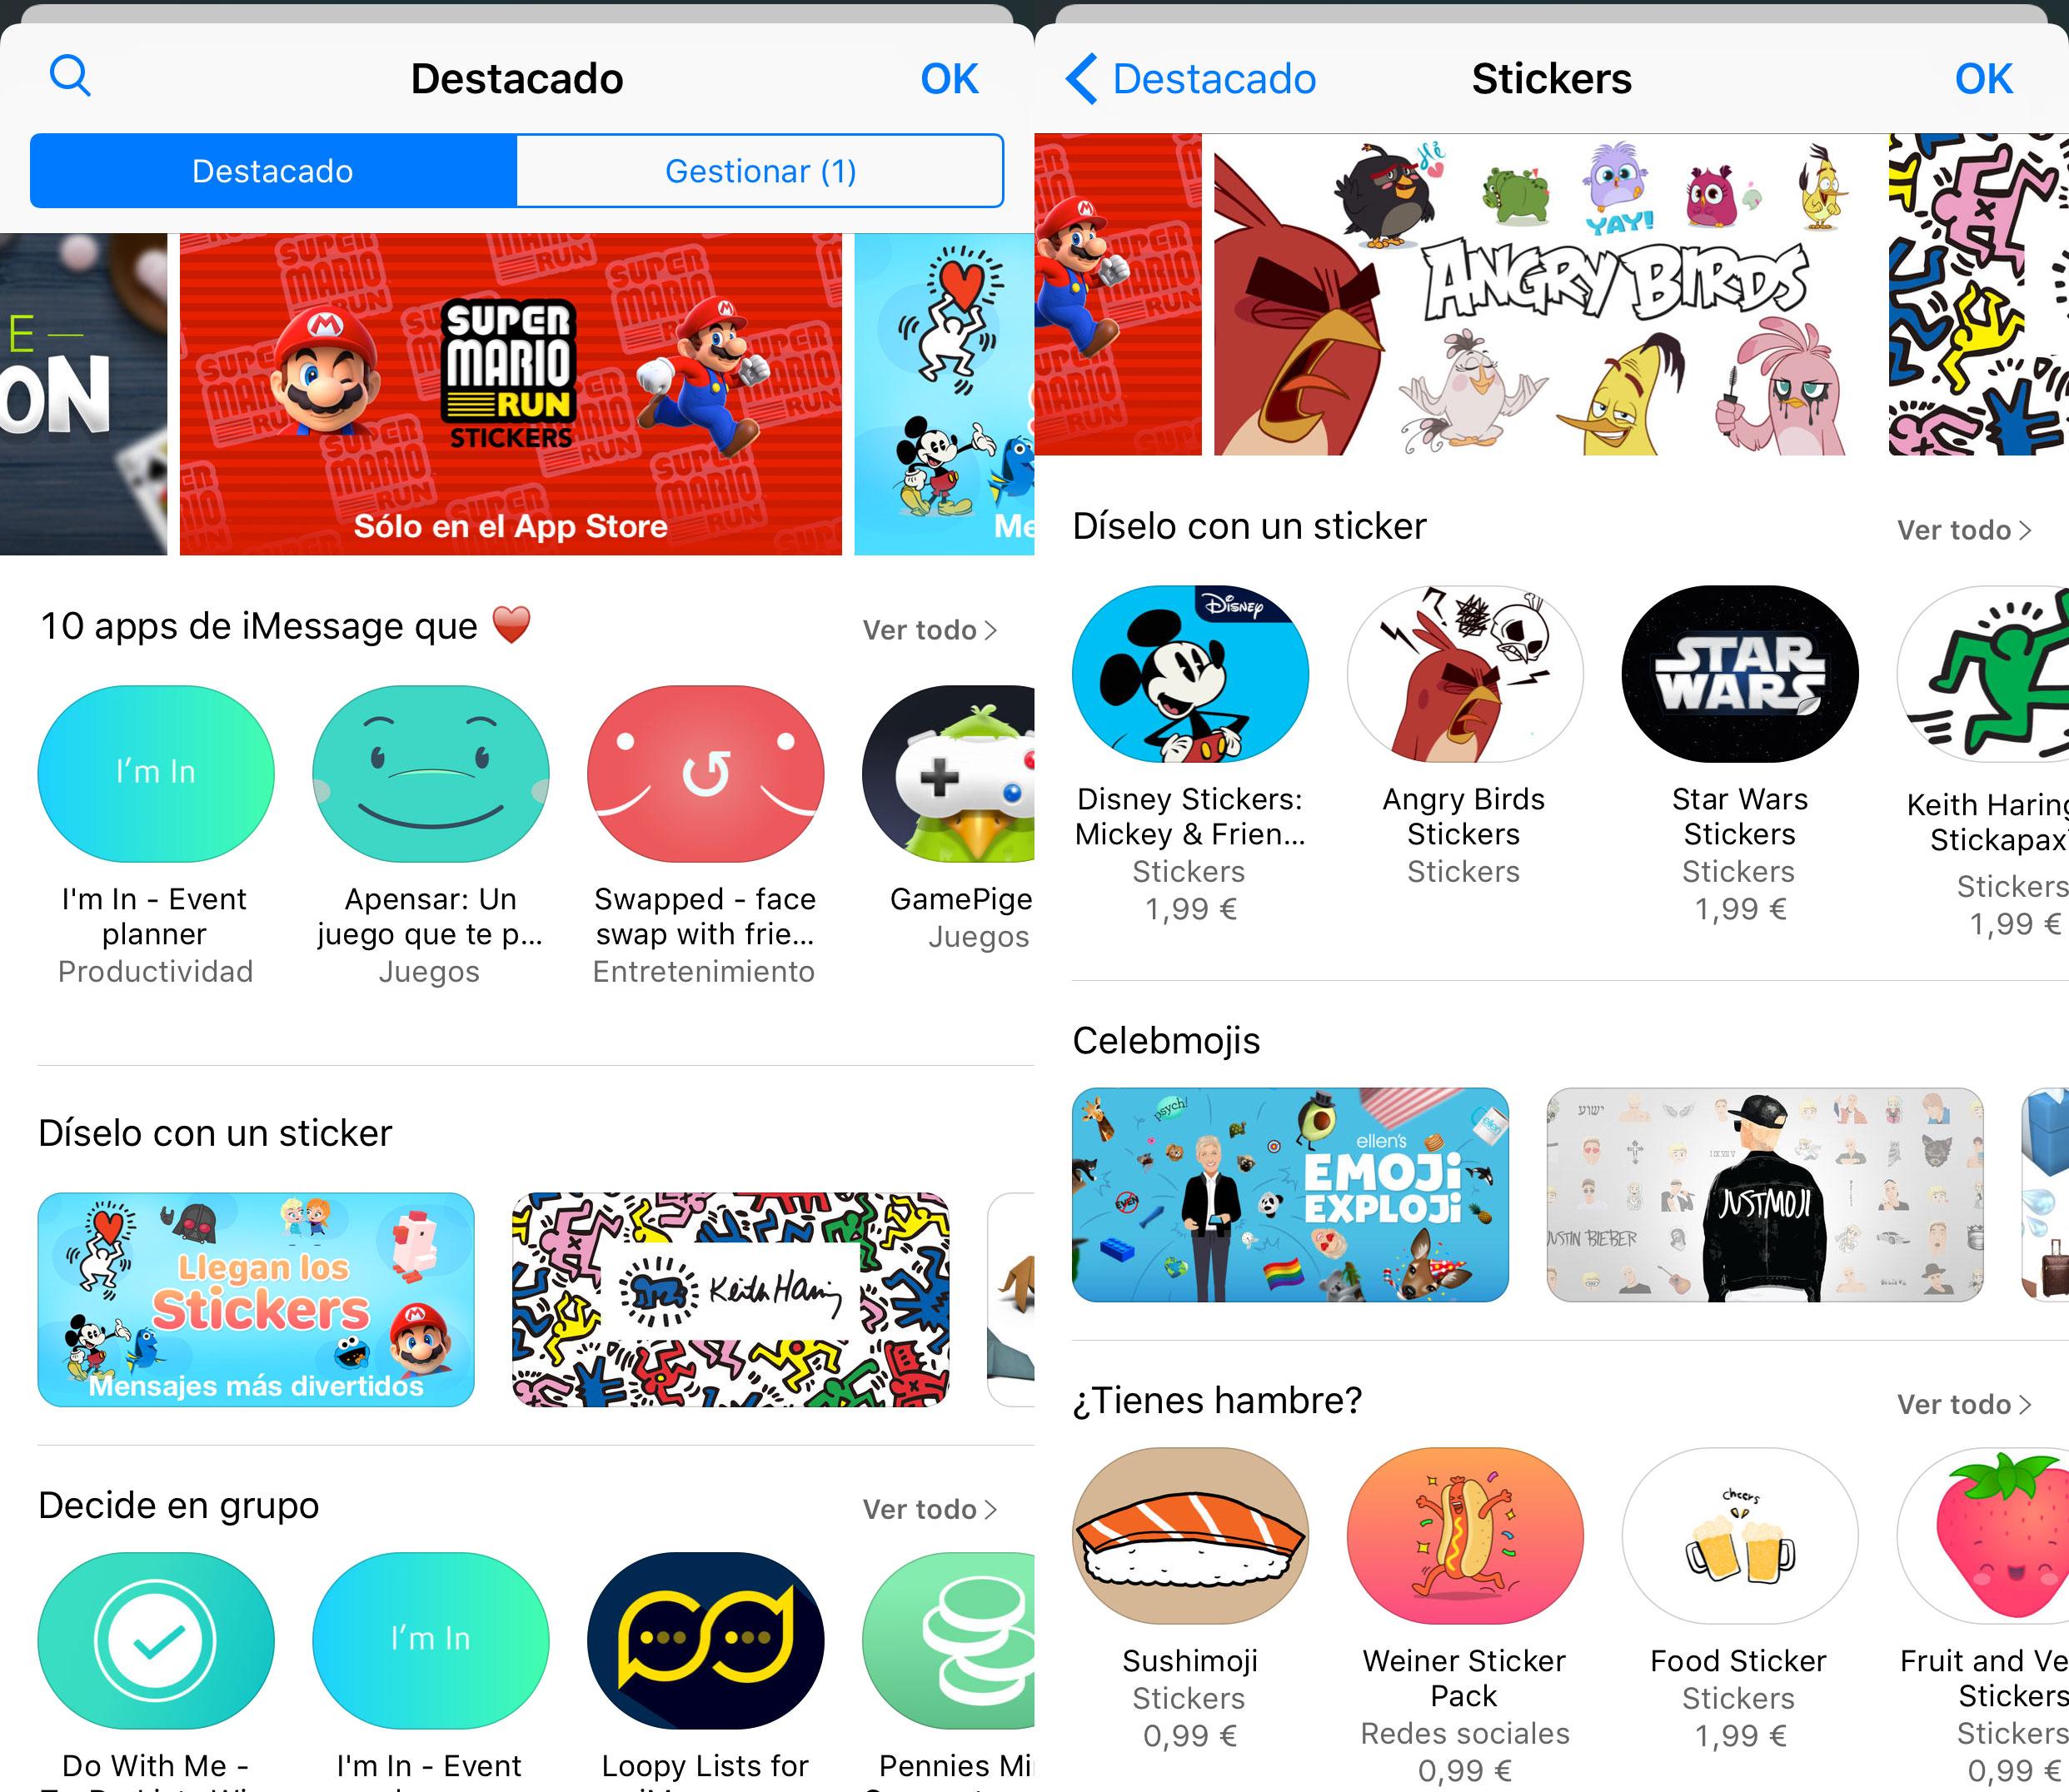 App Store de la App de Mensajes